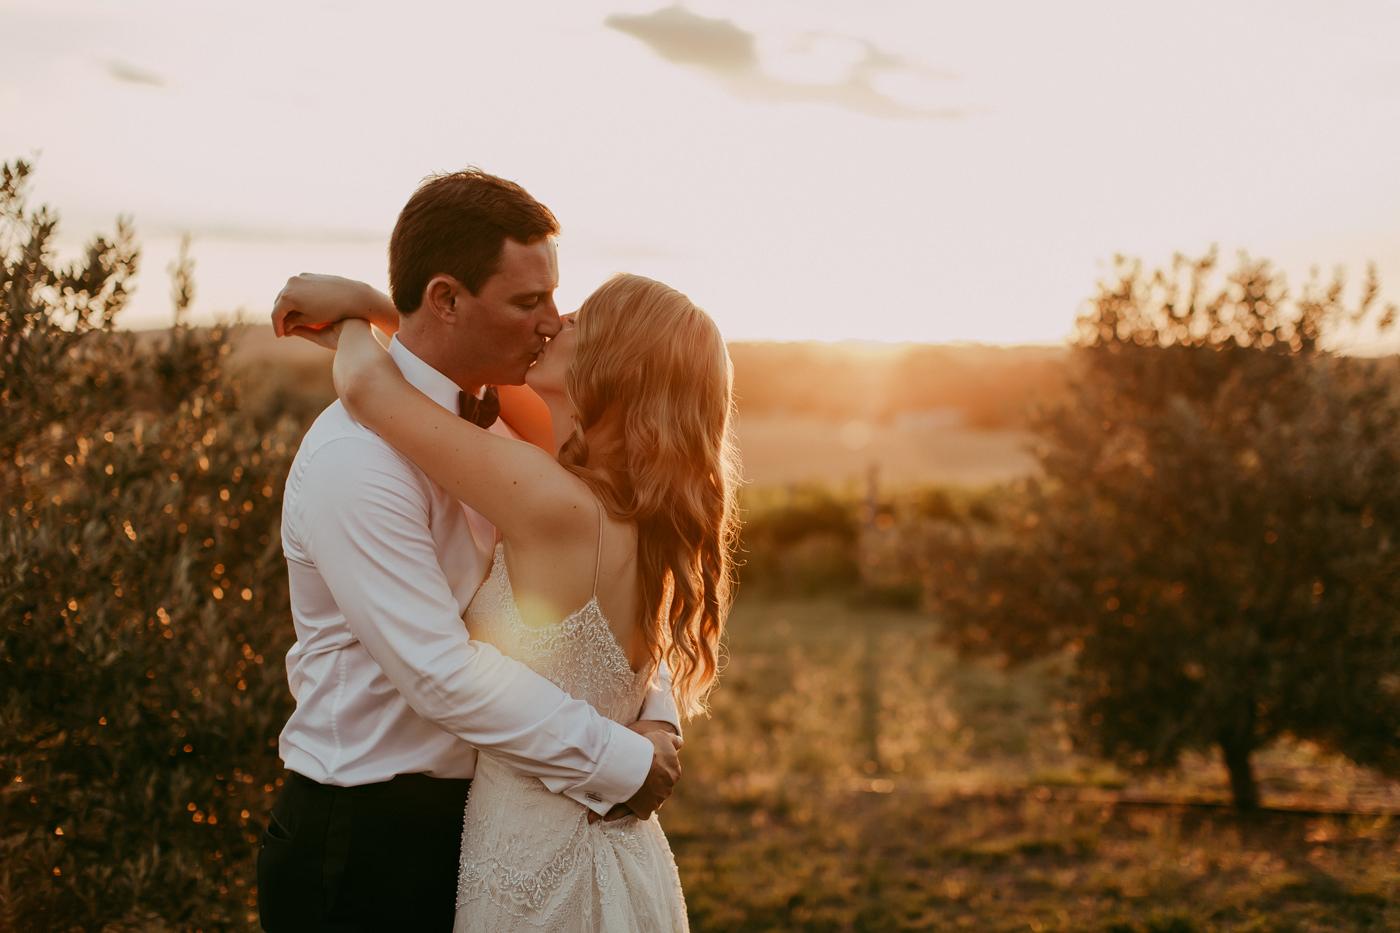 Anthony & Eliet - Wagga Wagga Wedding - Country NSW - Samantha Heather Photography-151.jpg